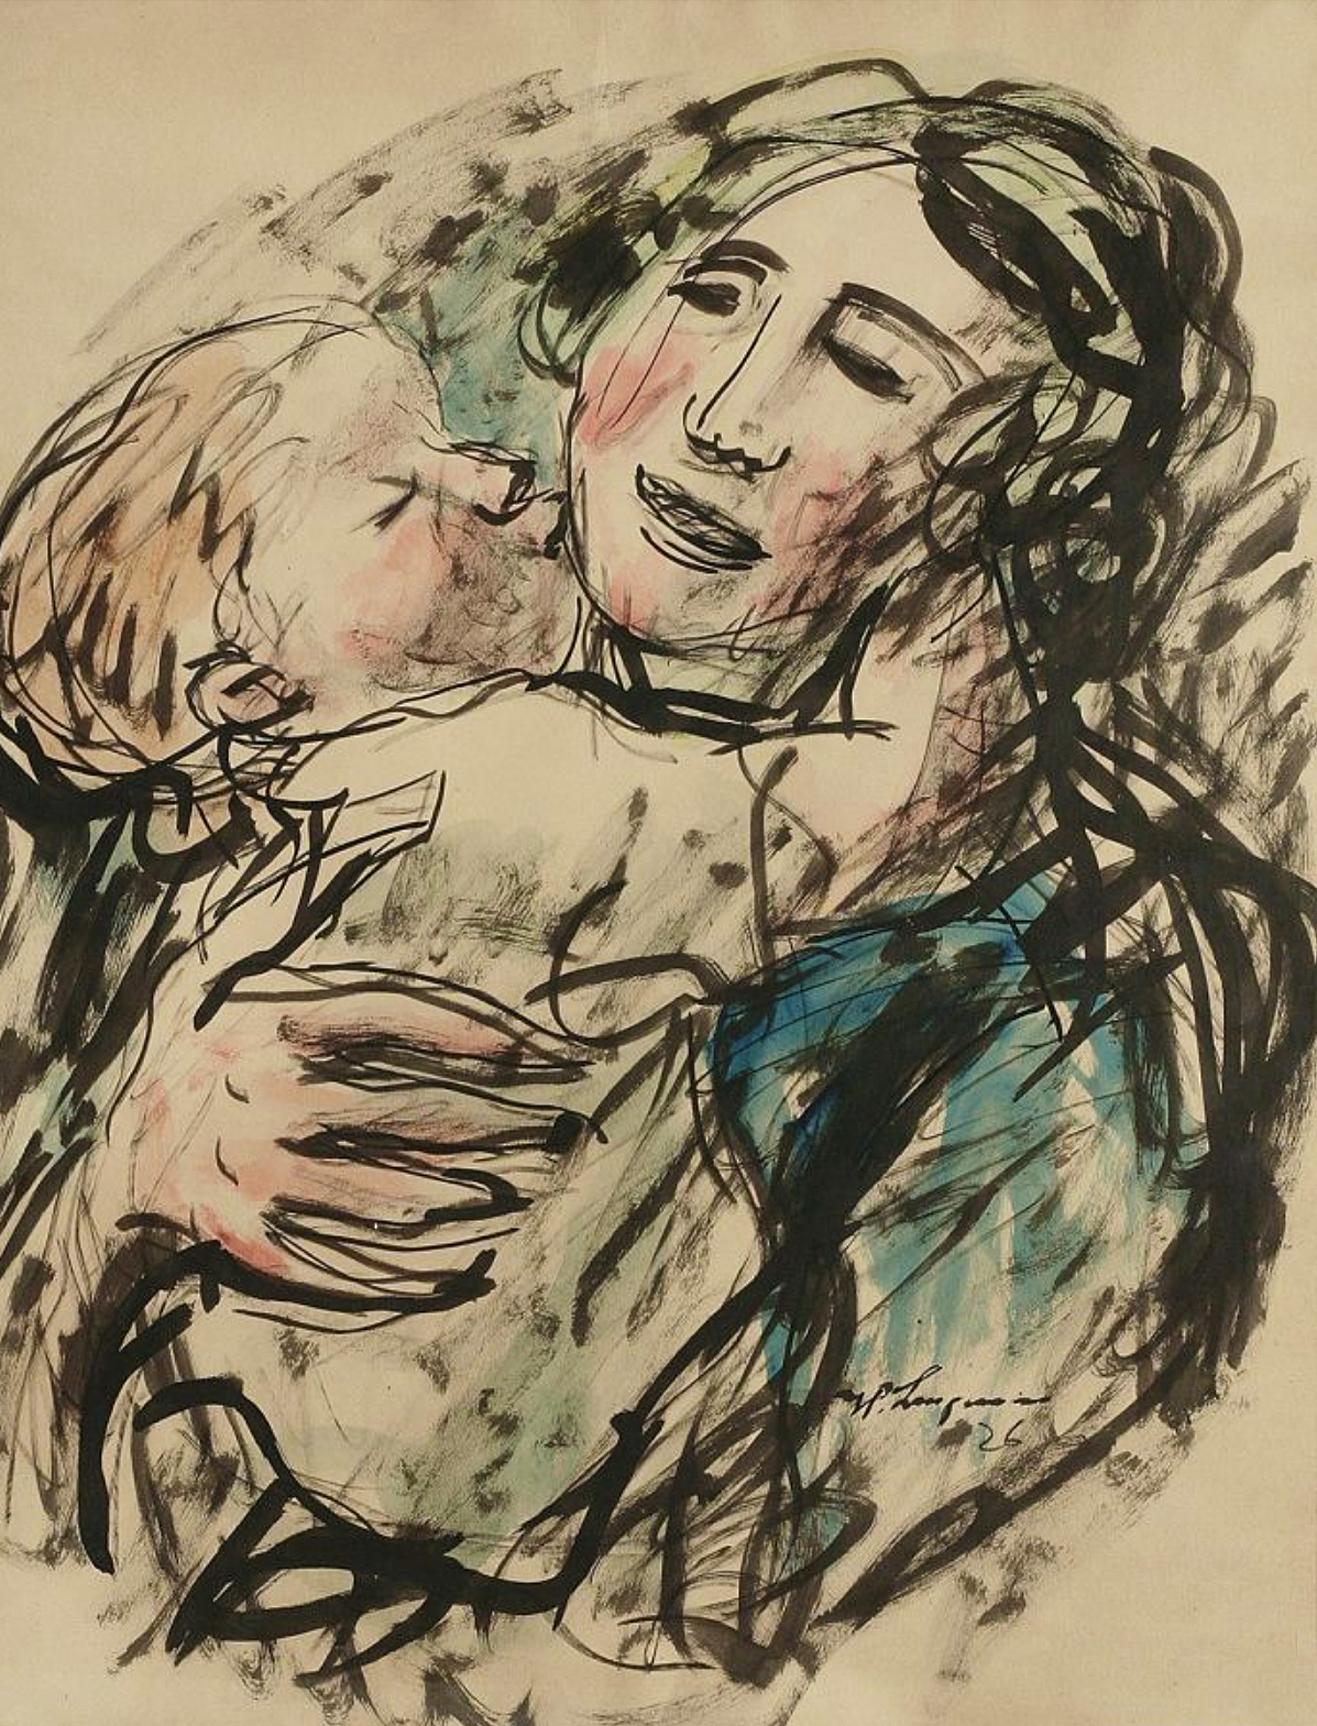 Генрик Лангерман. Материнство, 1926; папір, акварель, туш